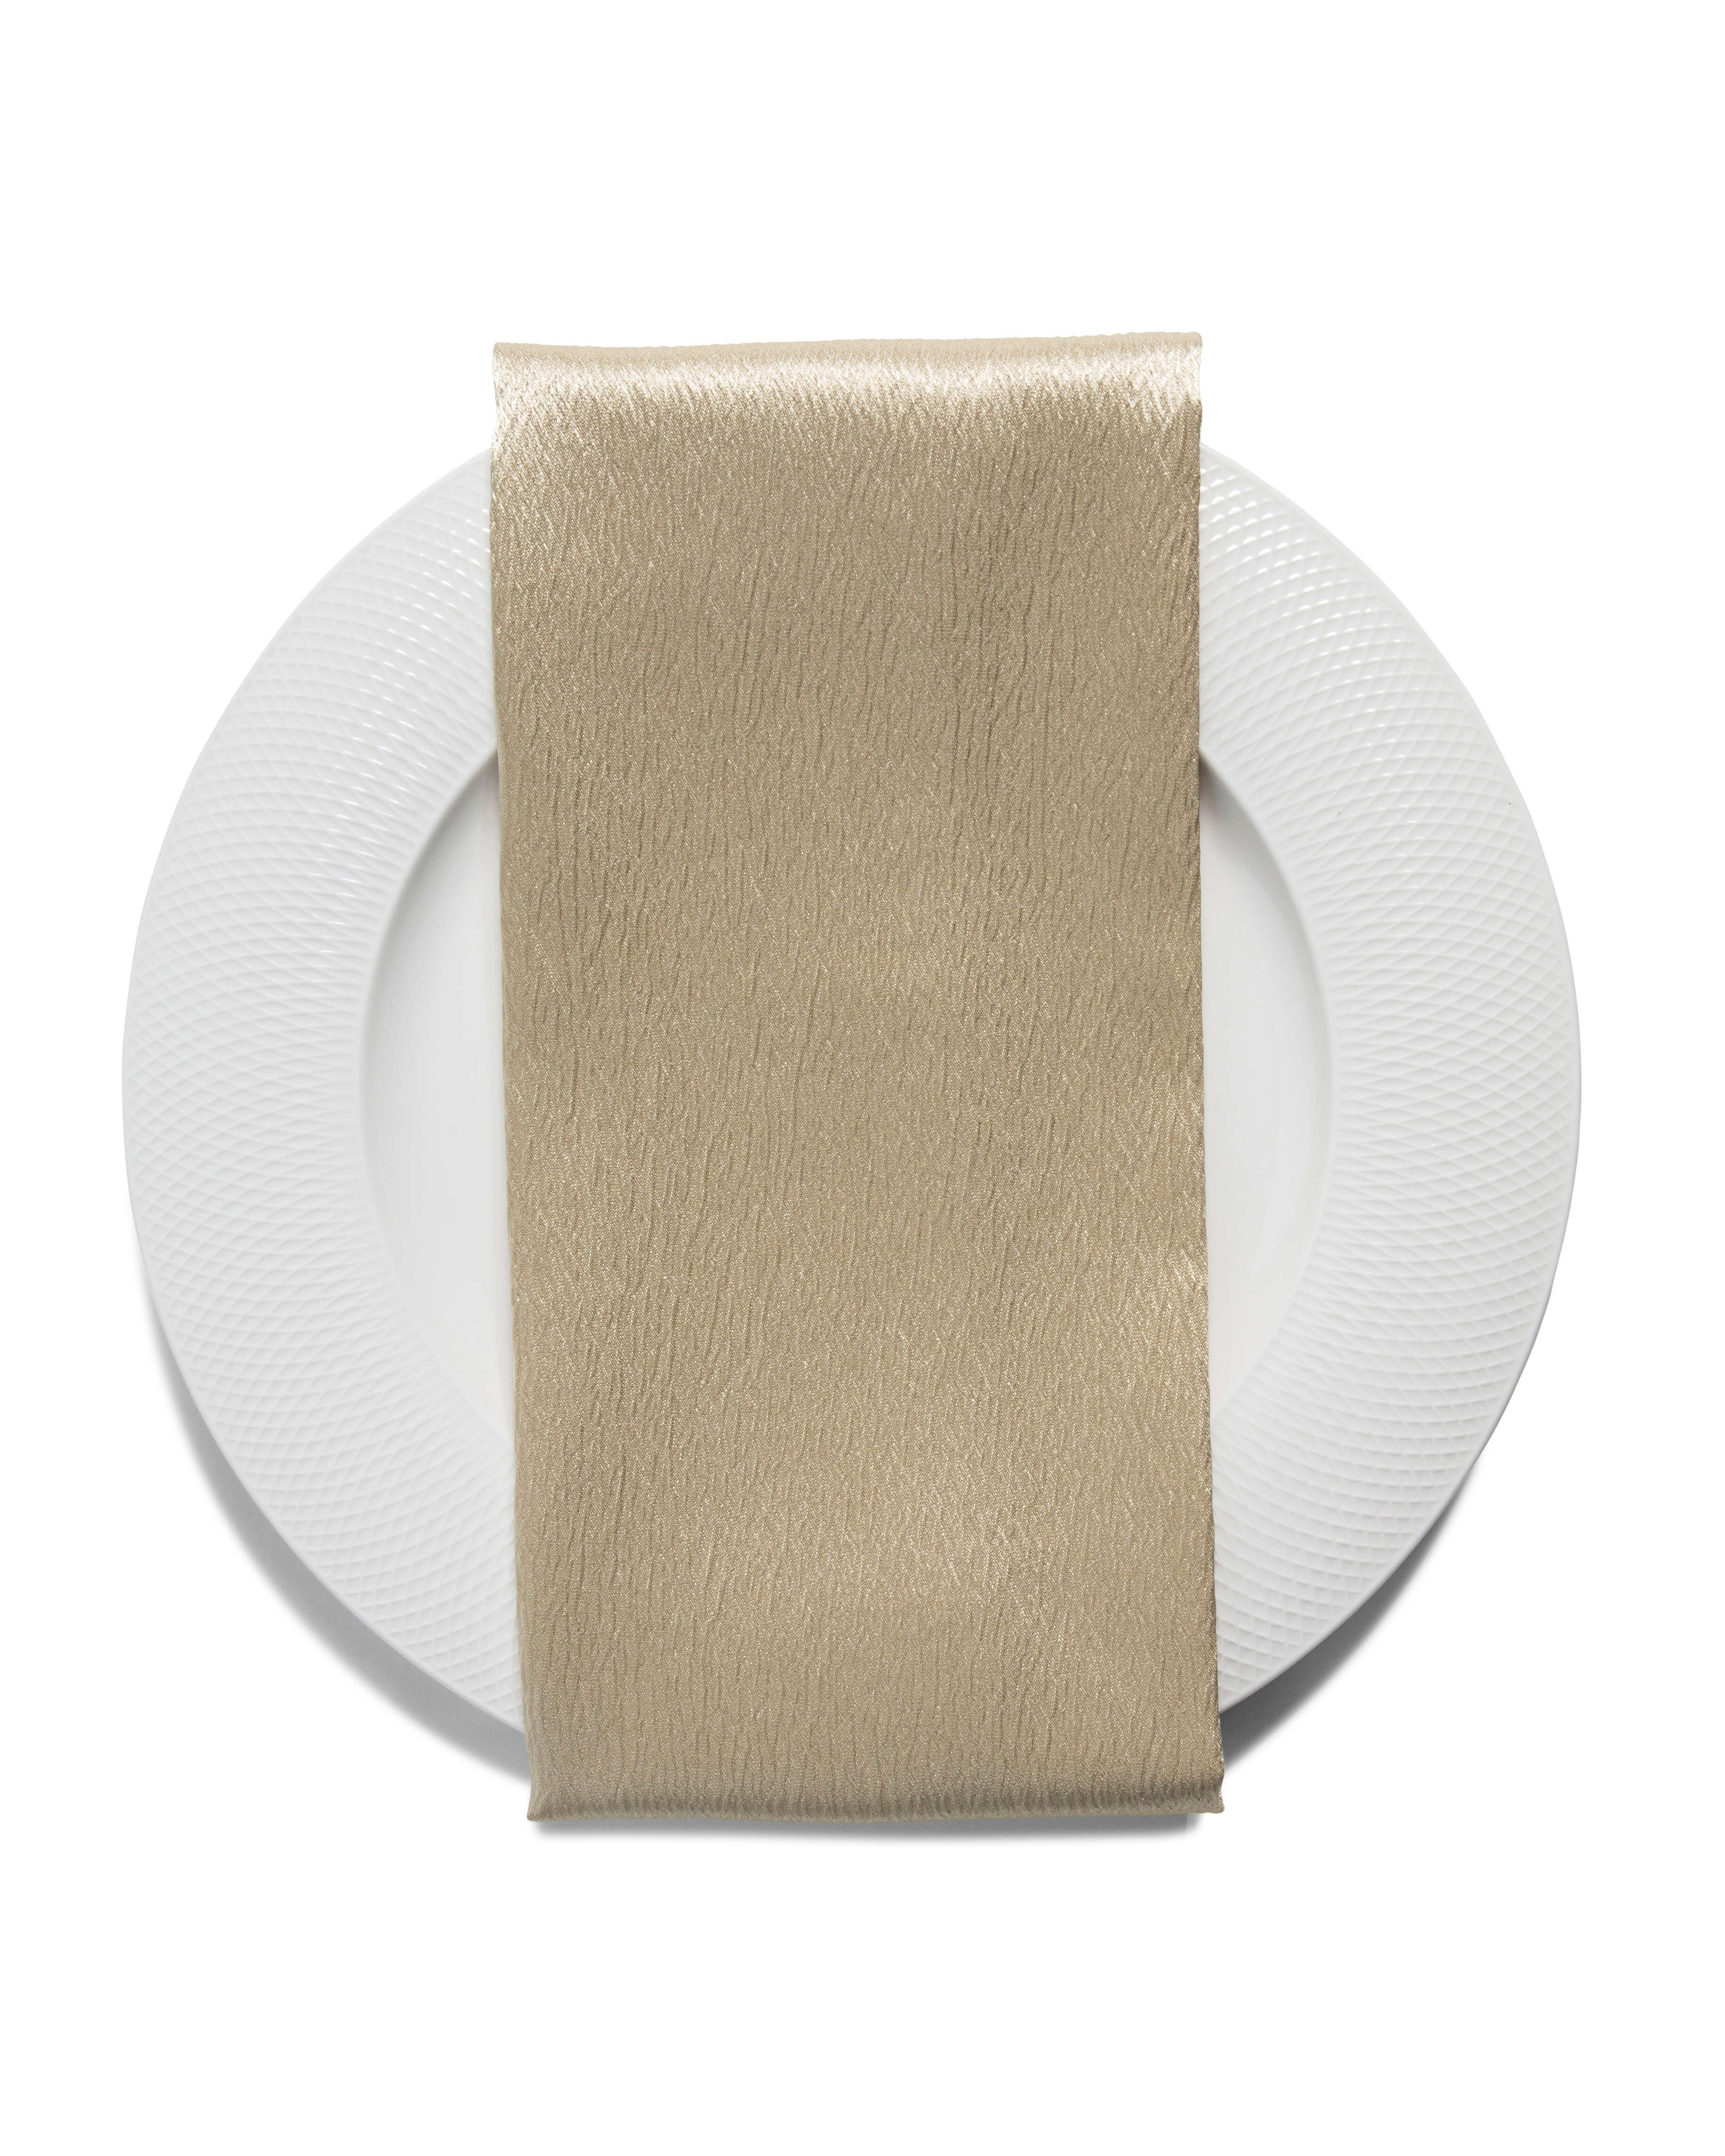 champagne napkin rental